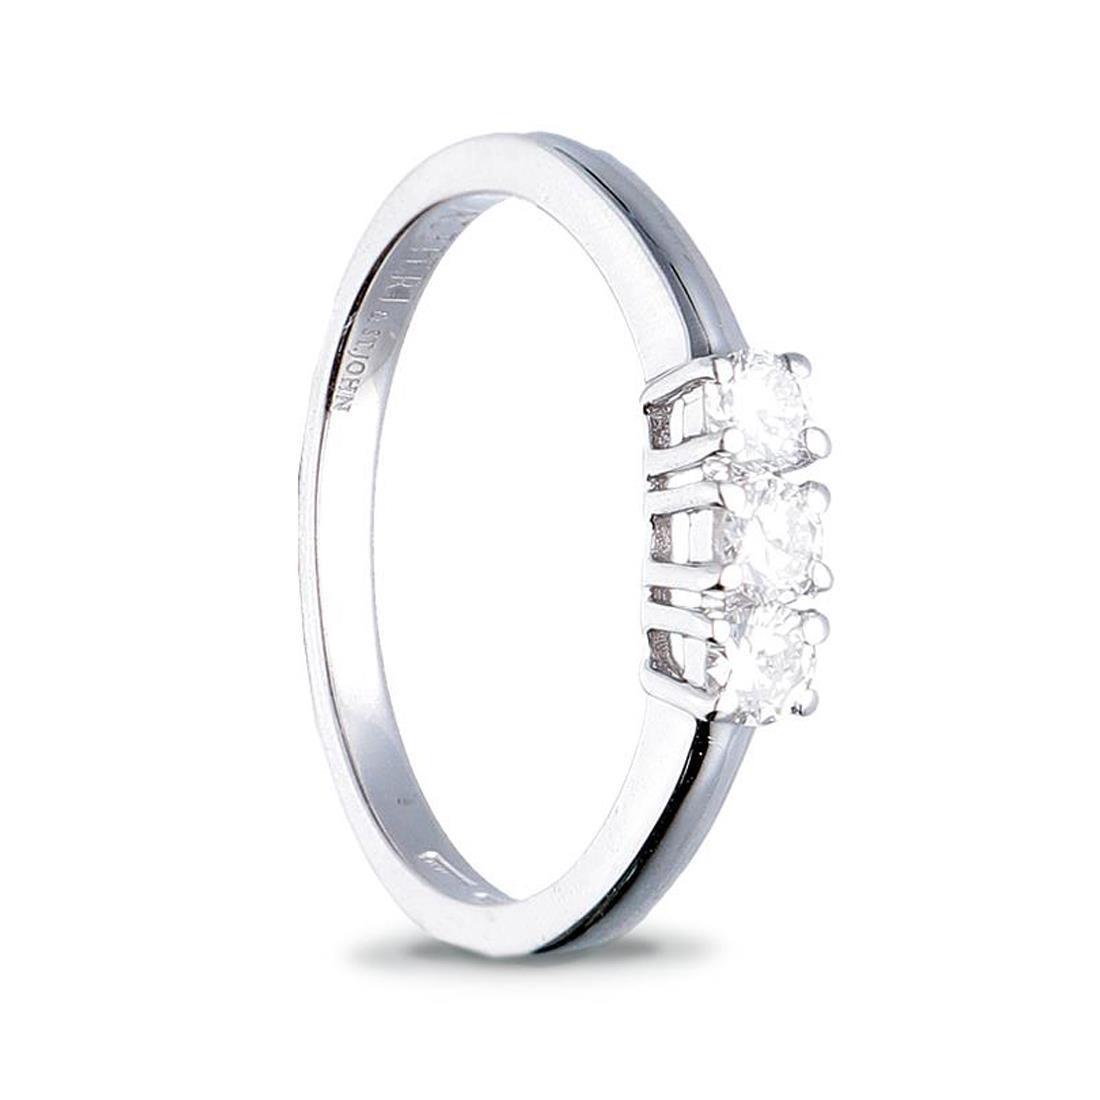 Trilogy ring in white gold, diamonds ct. 0.45 - ALFIERI & ST. JOHN